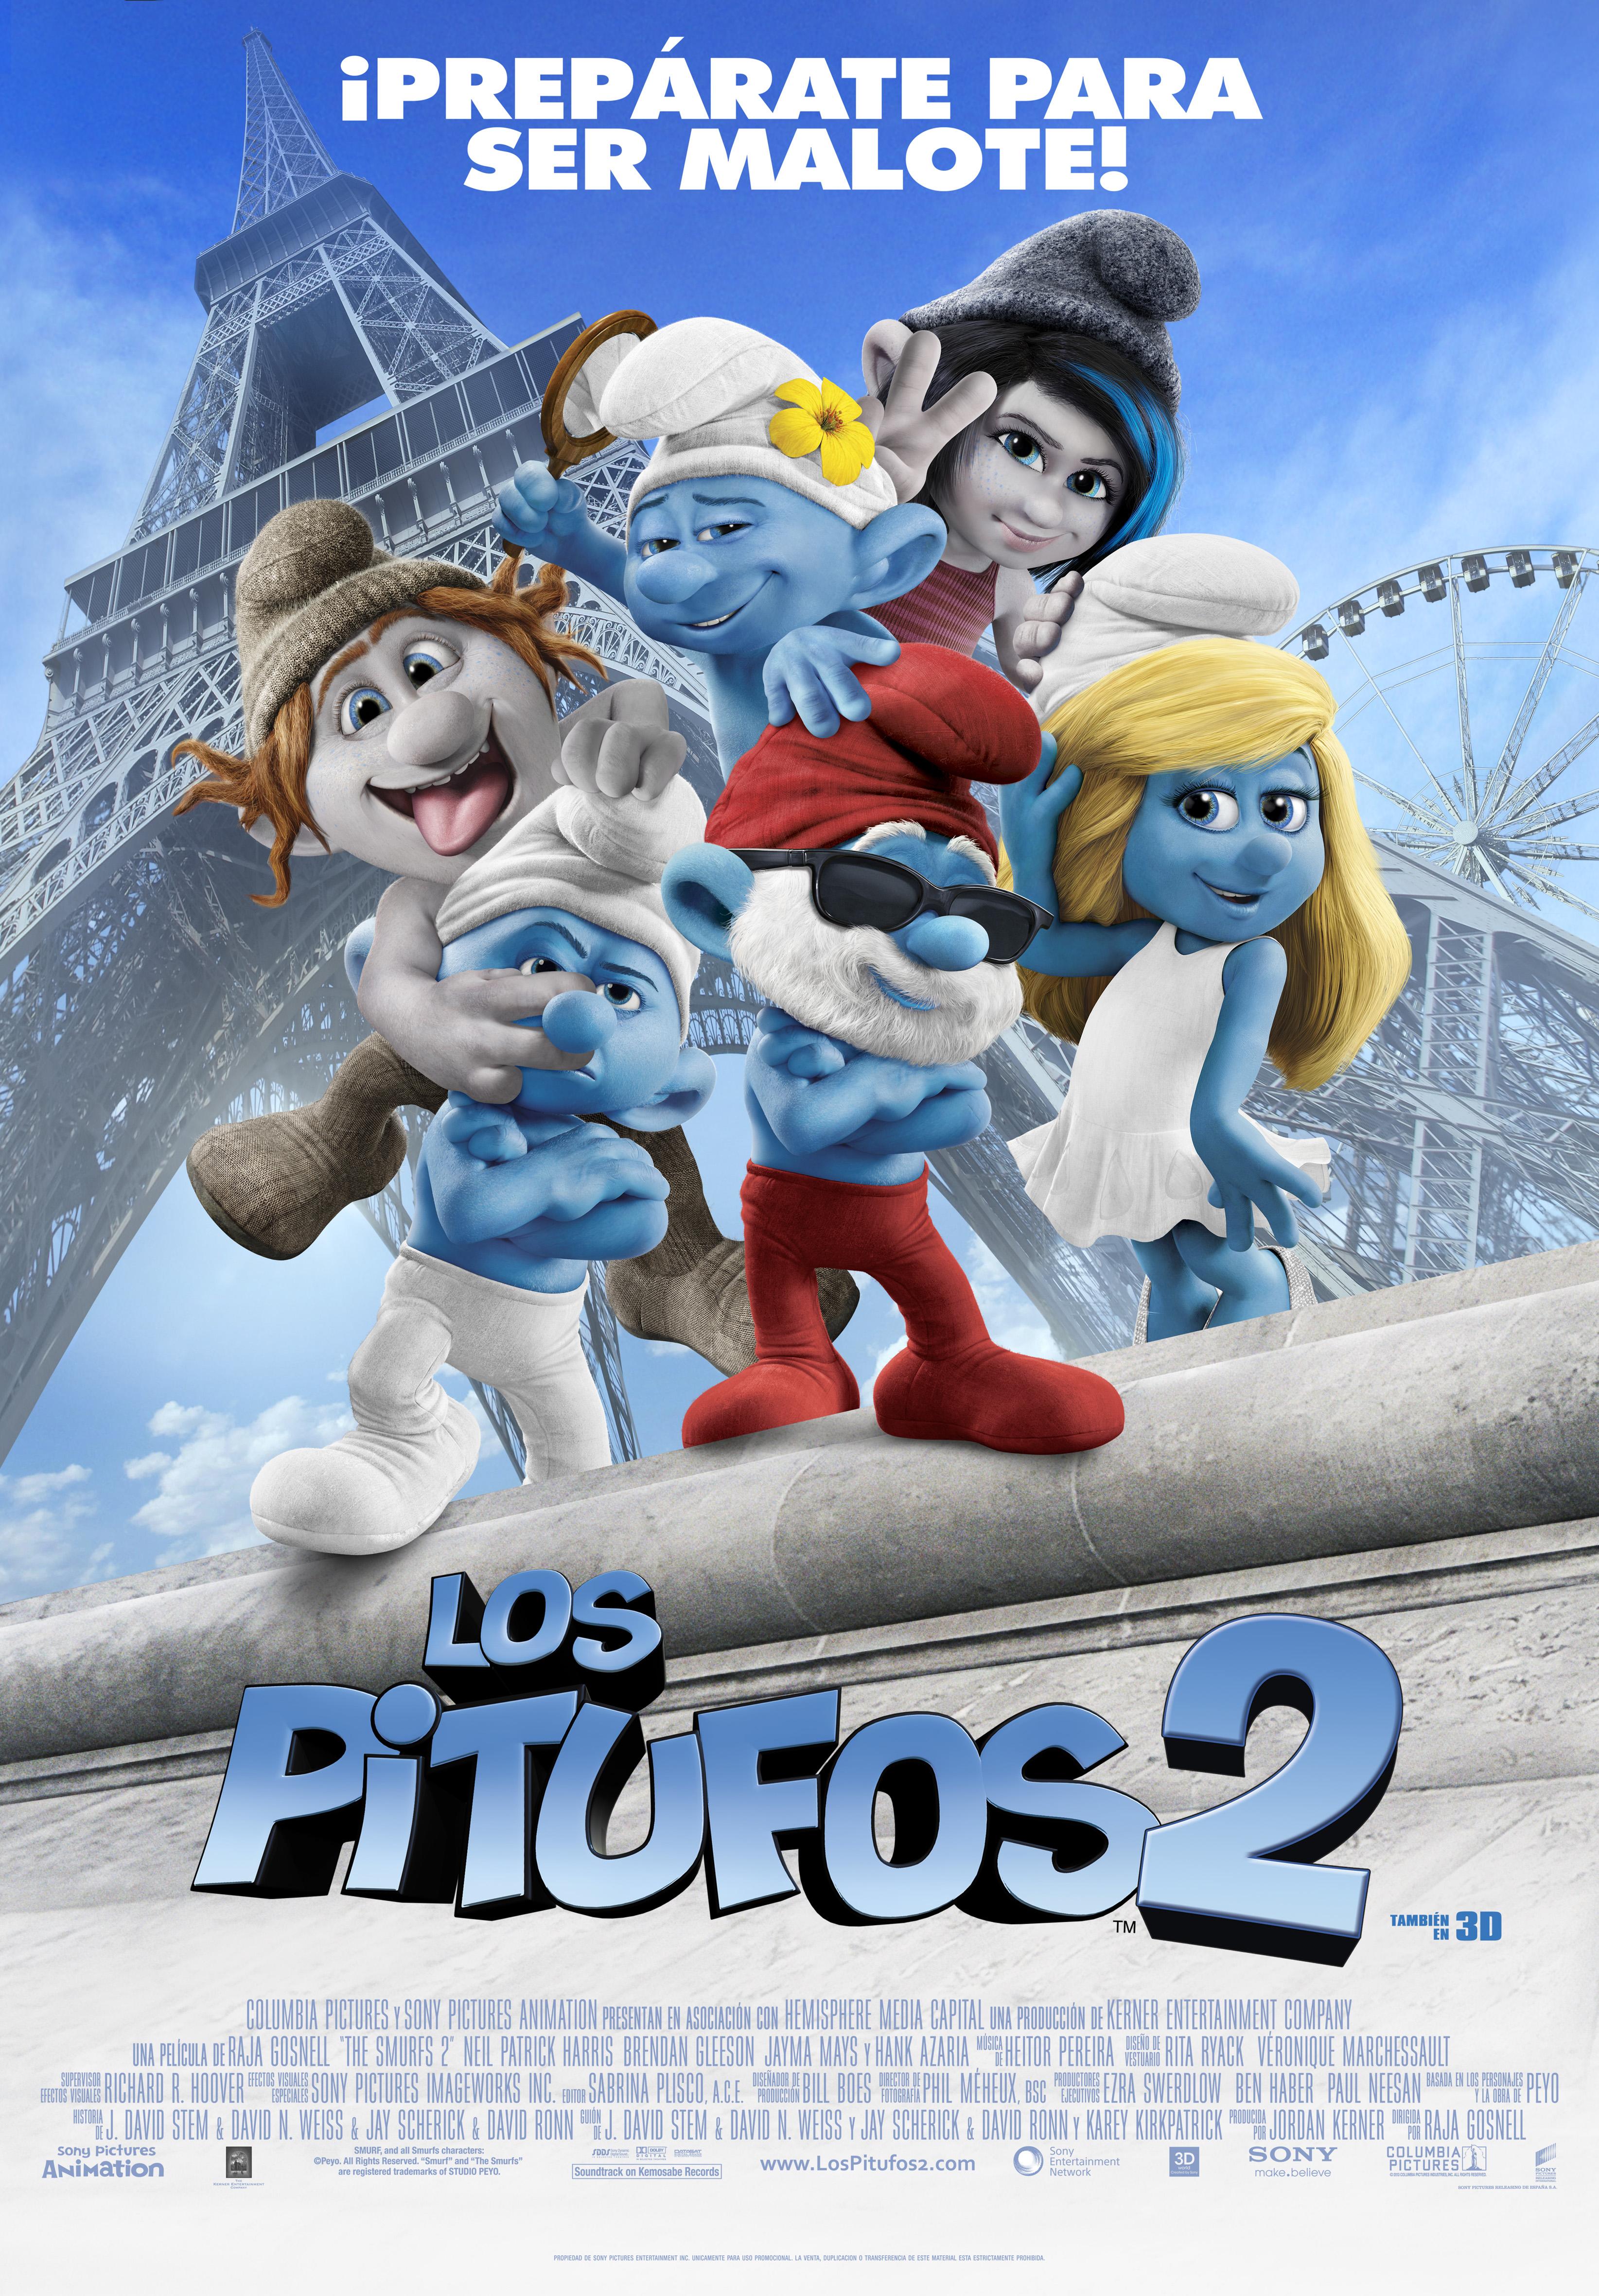 . Título:Los Pitufos 2 (The Smurfs 2) Director:Raja Gosnell Guión:Peyo (creador), J.David Stem, David N. Weiss, Jay Scherick, David Ronn, Karey Kirkpatrick Reparto:Hank Azaria, Neil Patrick Harris, Brendan Gleeson, Jayma […]